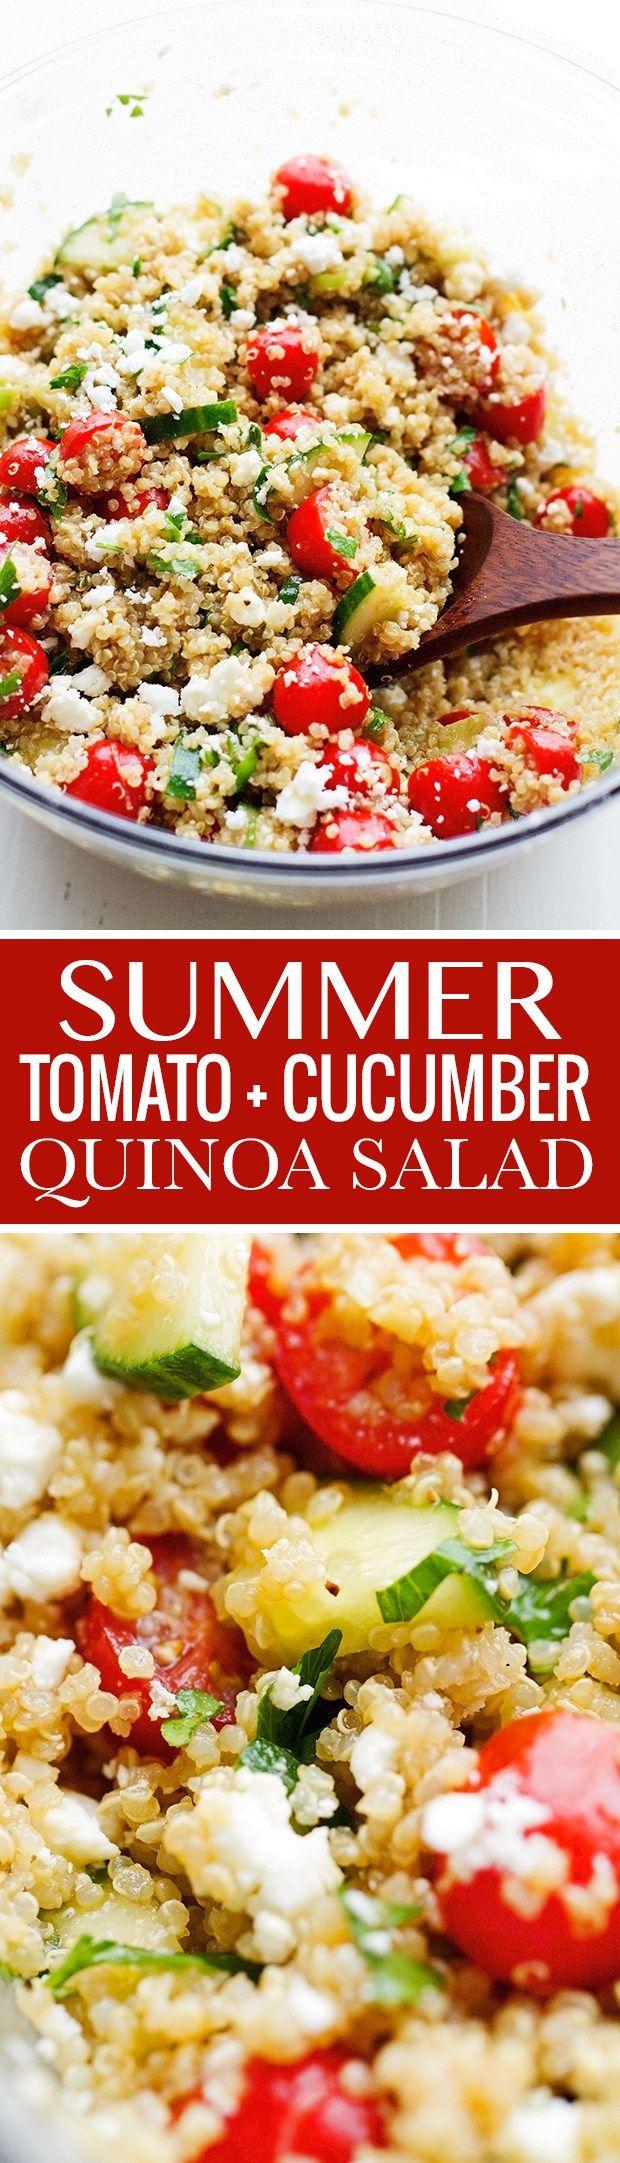 Summer Tomato and Cucumber Quinoa Salad - perfect for when you have leftover quinoa! #vegetarian #quinoasalad #cucumbersalad #tomatosalad #tabbouleh | Littlespicejar.com @LittleSpiceJar